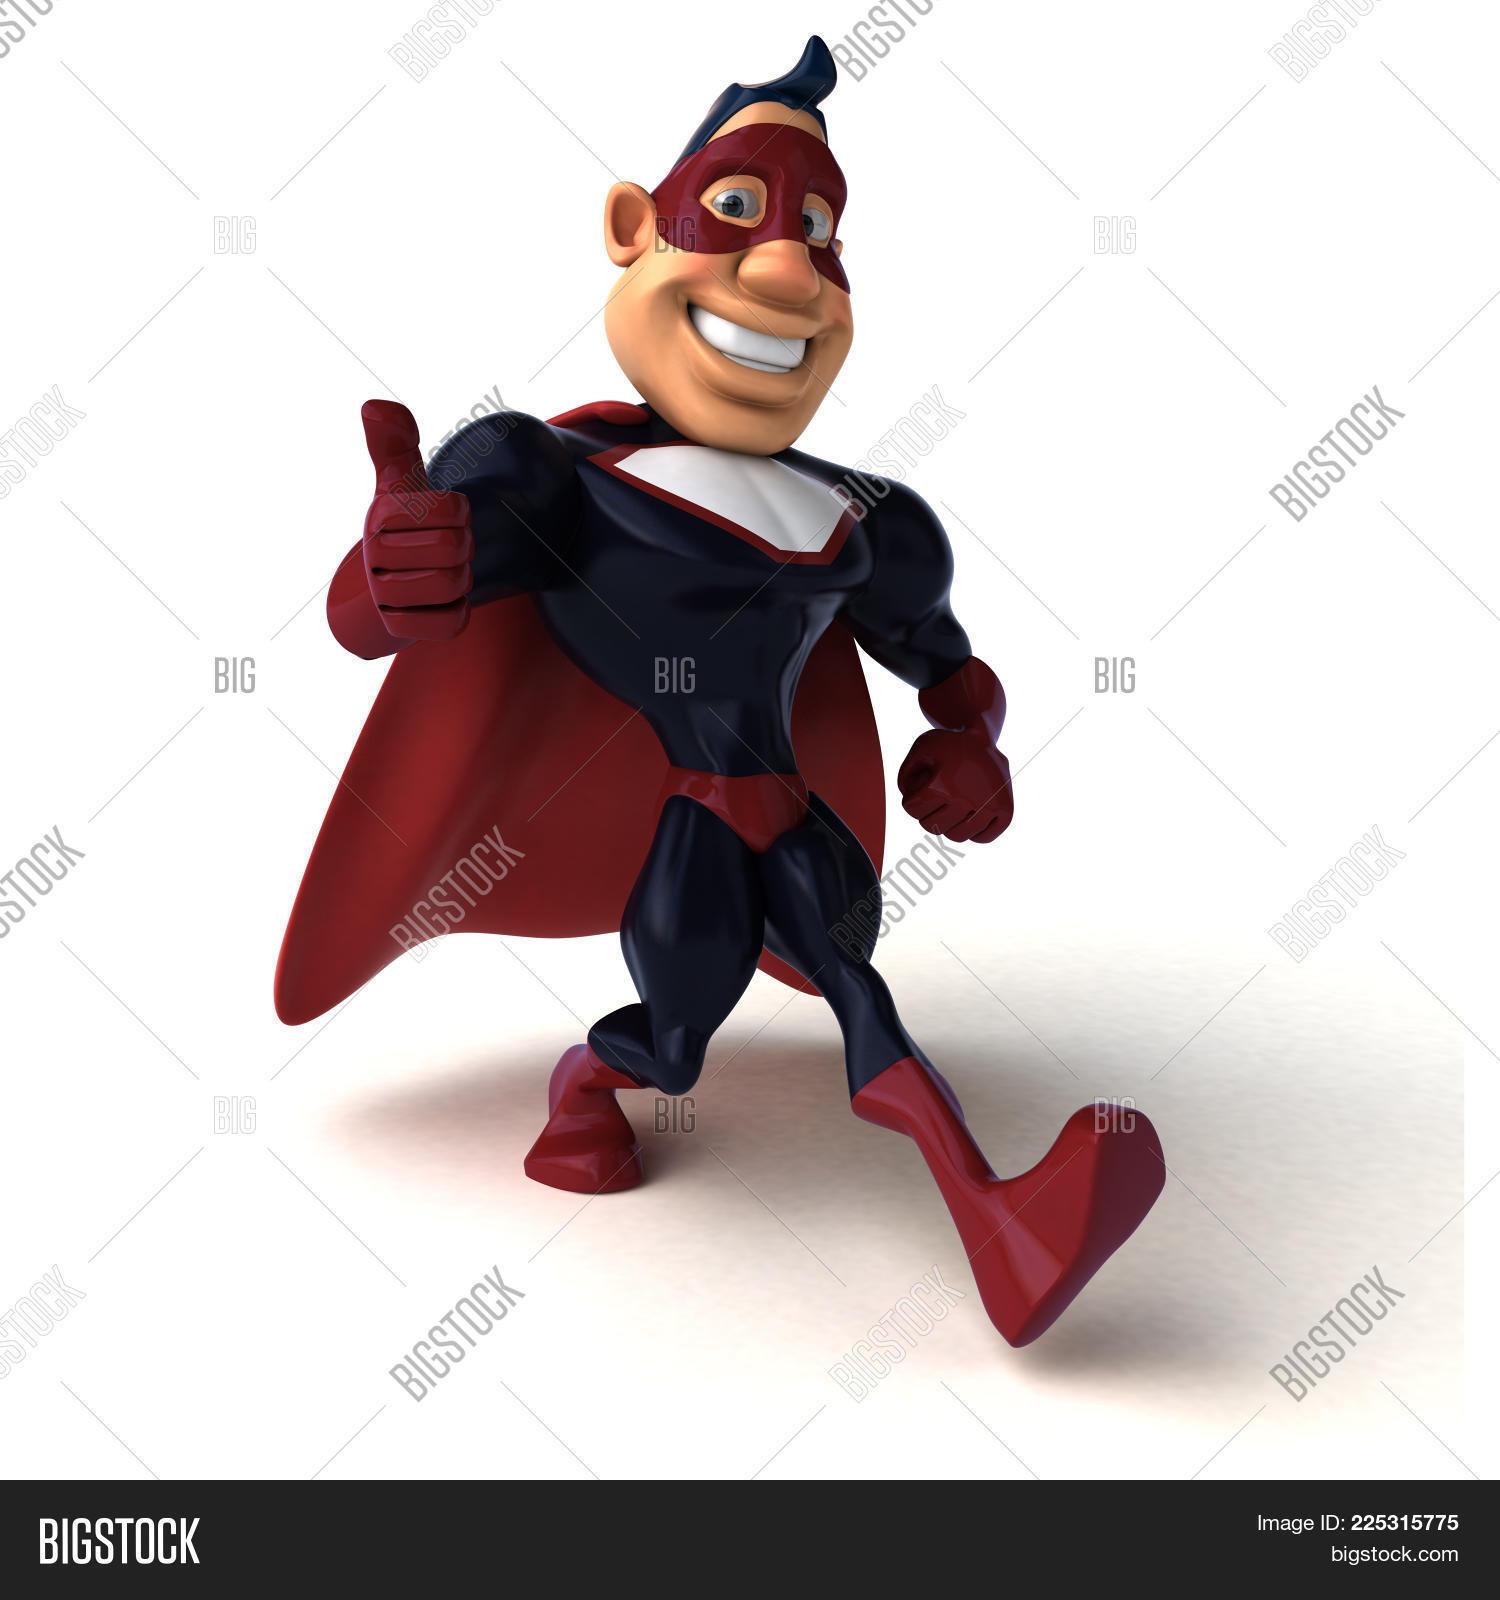 disguise illustration fun superhero powerpoint template disguise